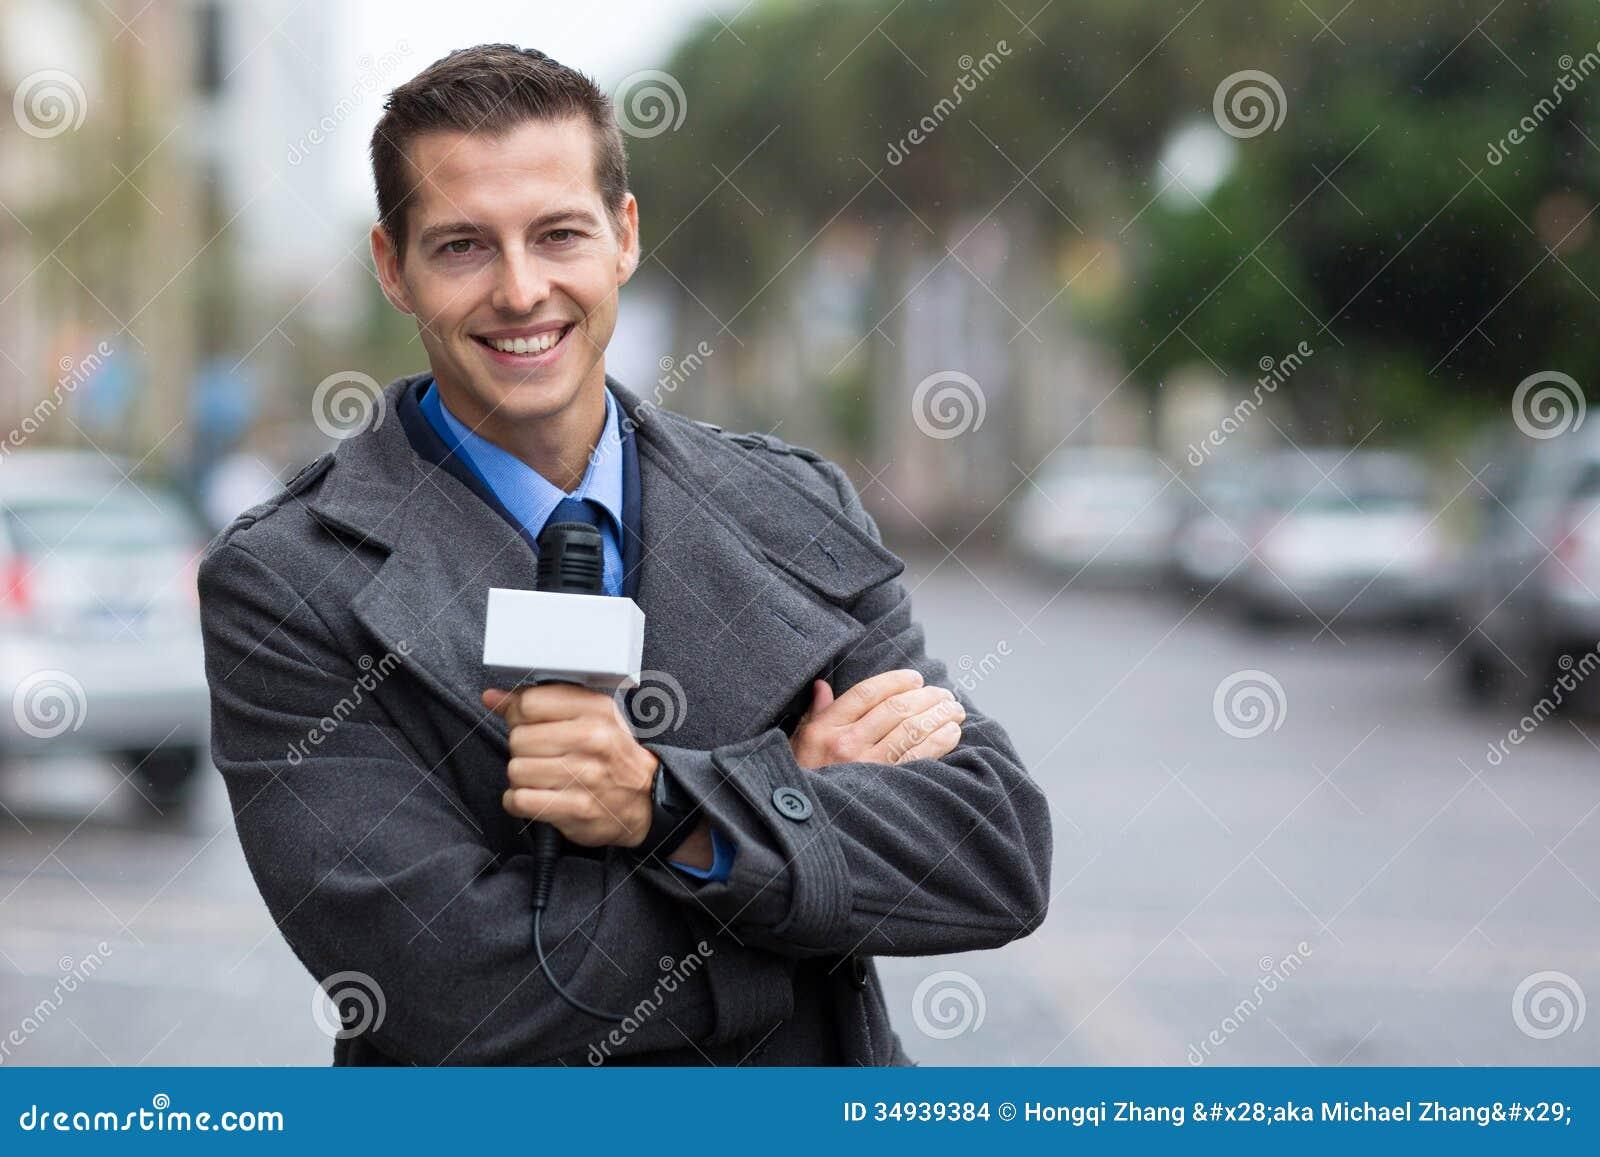 Professional news reporter